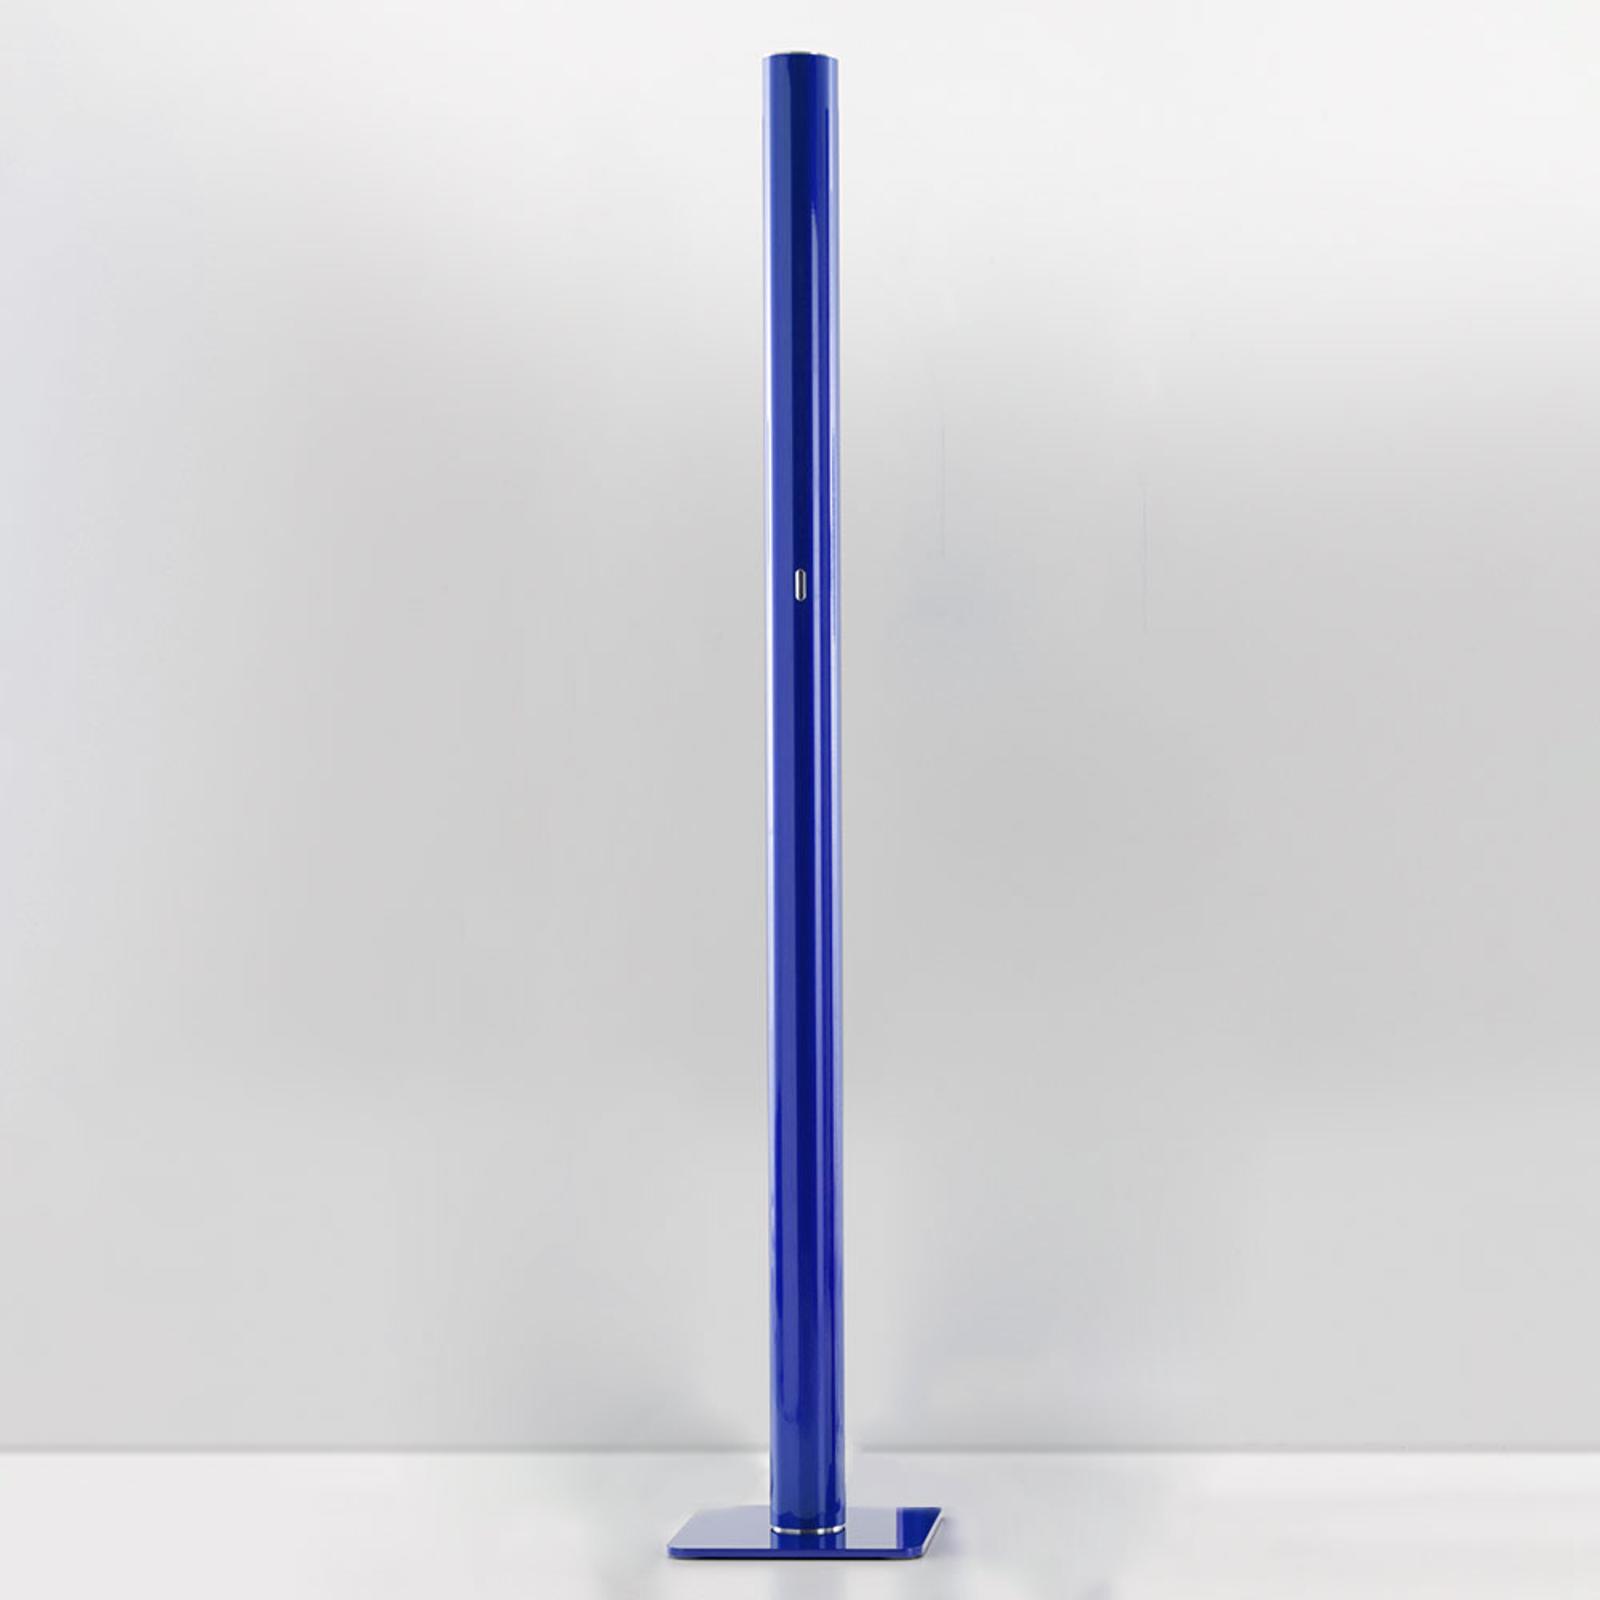 Artemide Ilio - LED-gulvlampe, App, blå, 2700K